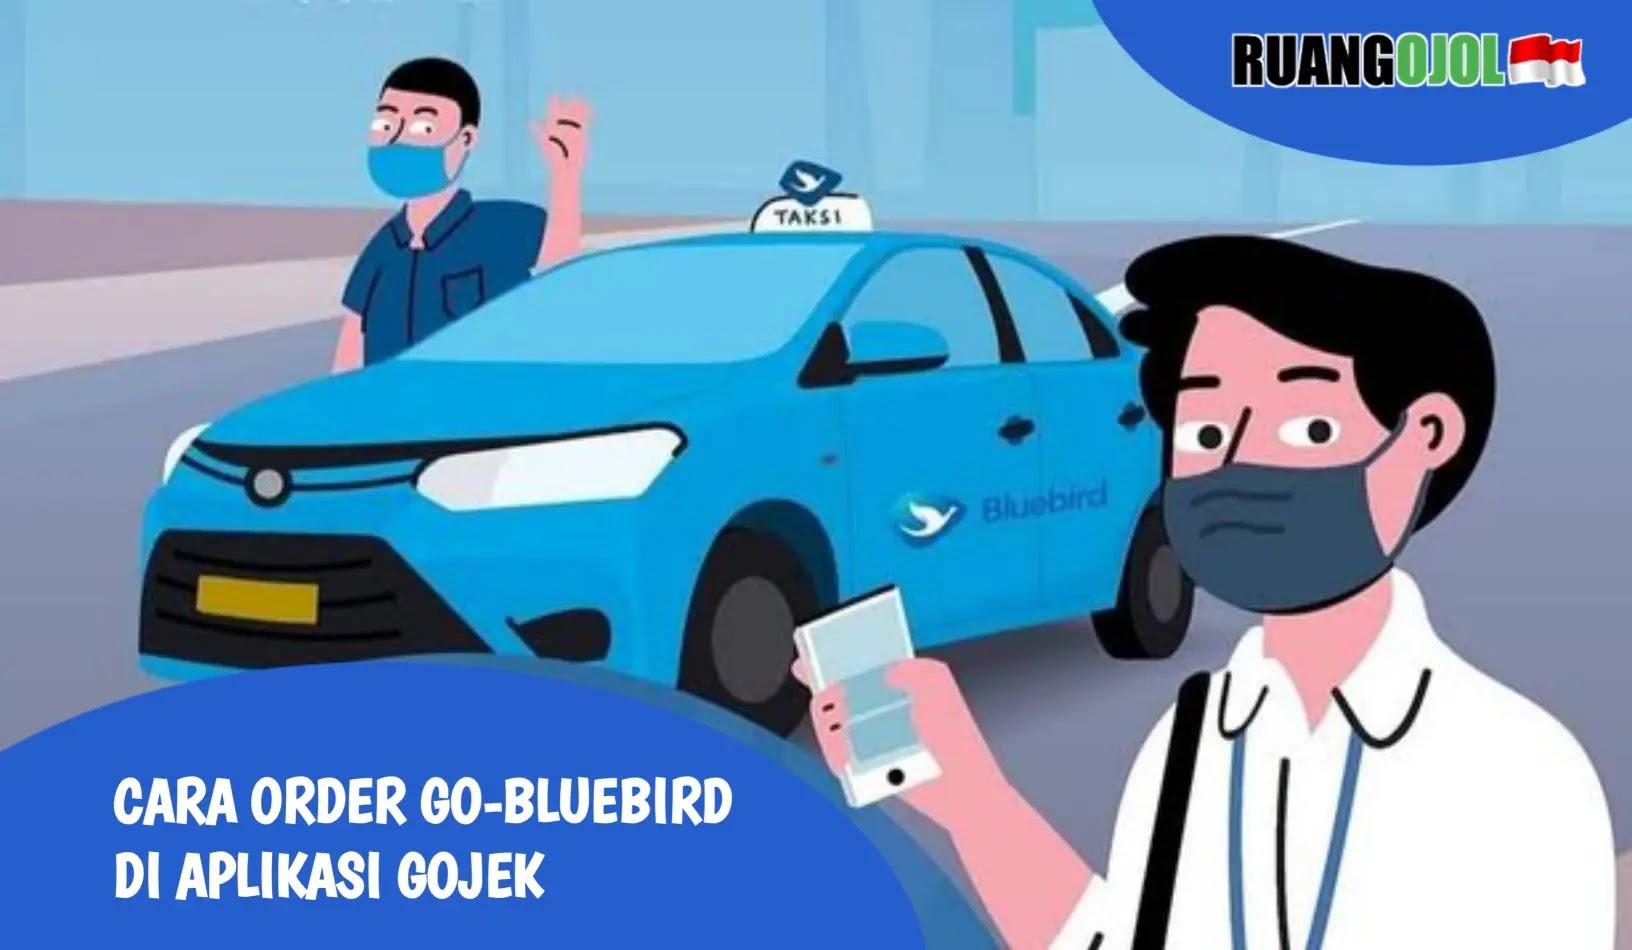 Cara Pesan Layanan Go-BlueBird di Aplikasi Gojek yang Benar